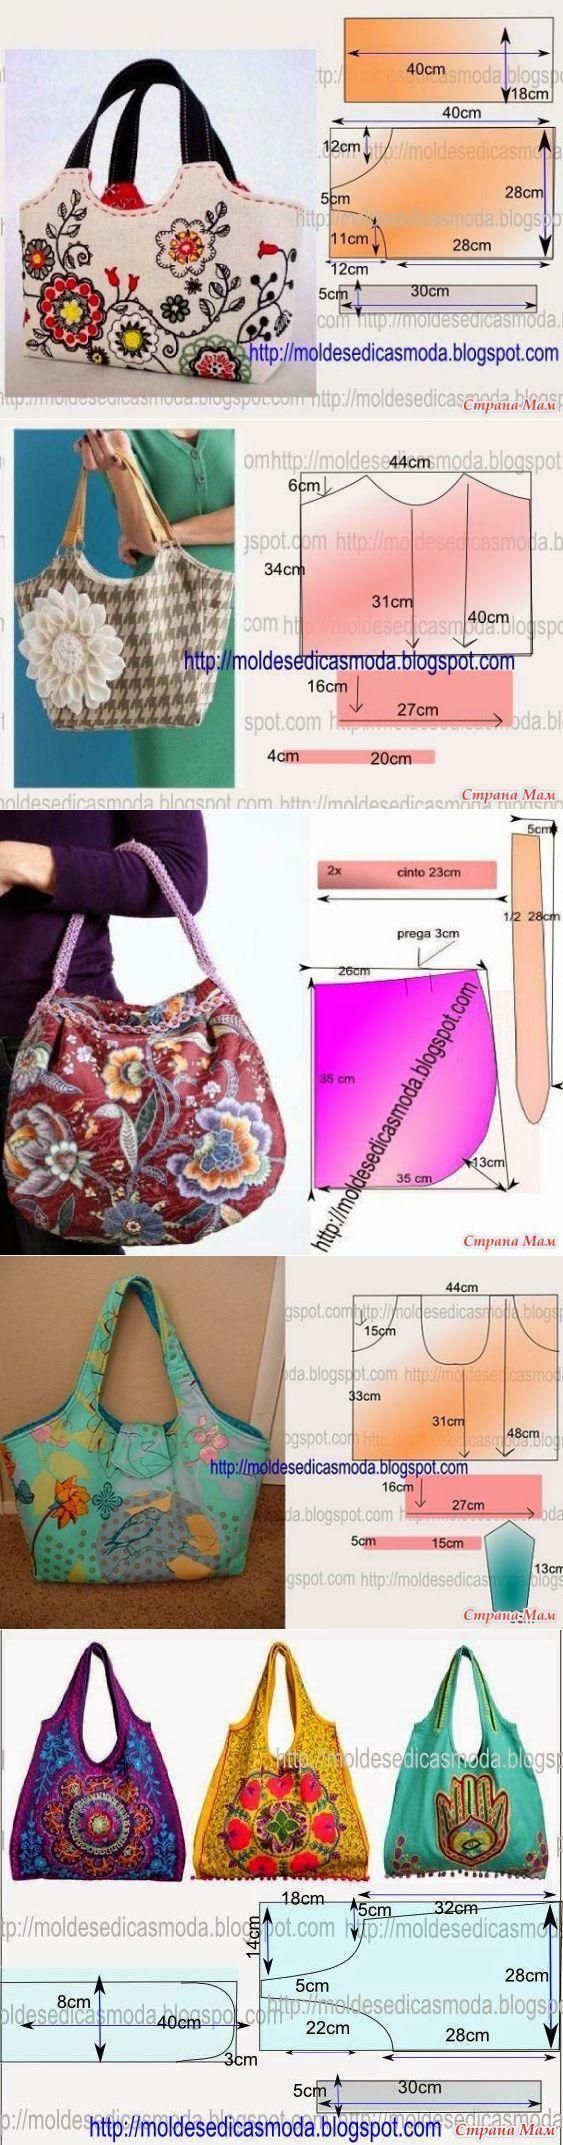 Bags Designs Templates...♥ Deniz ♥: